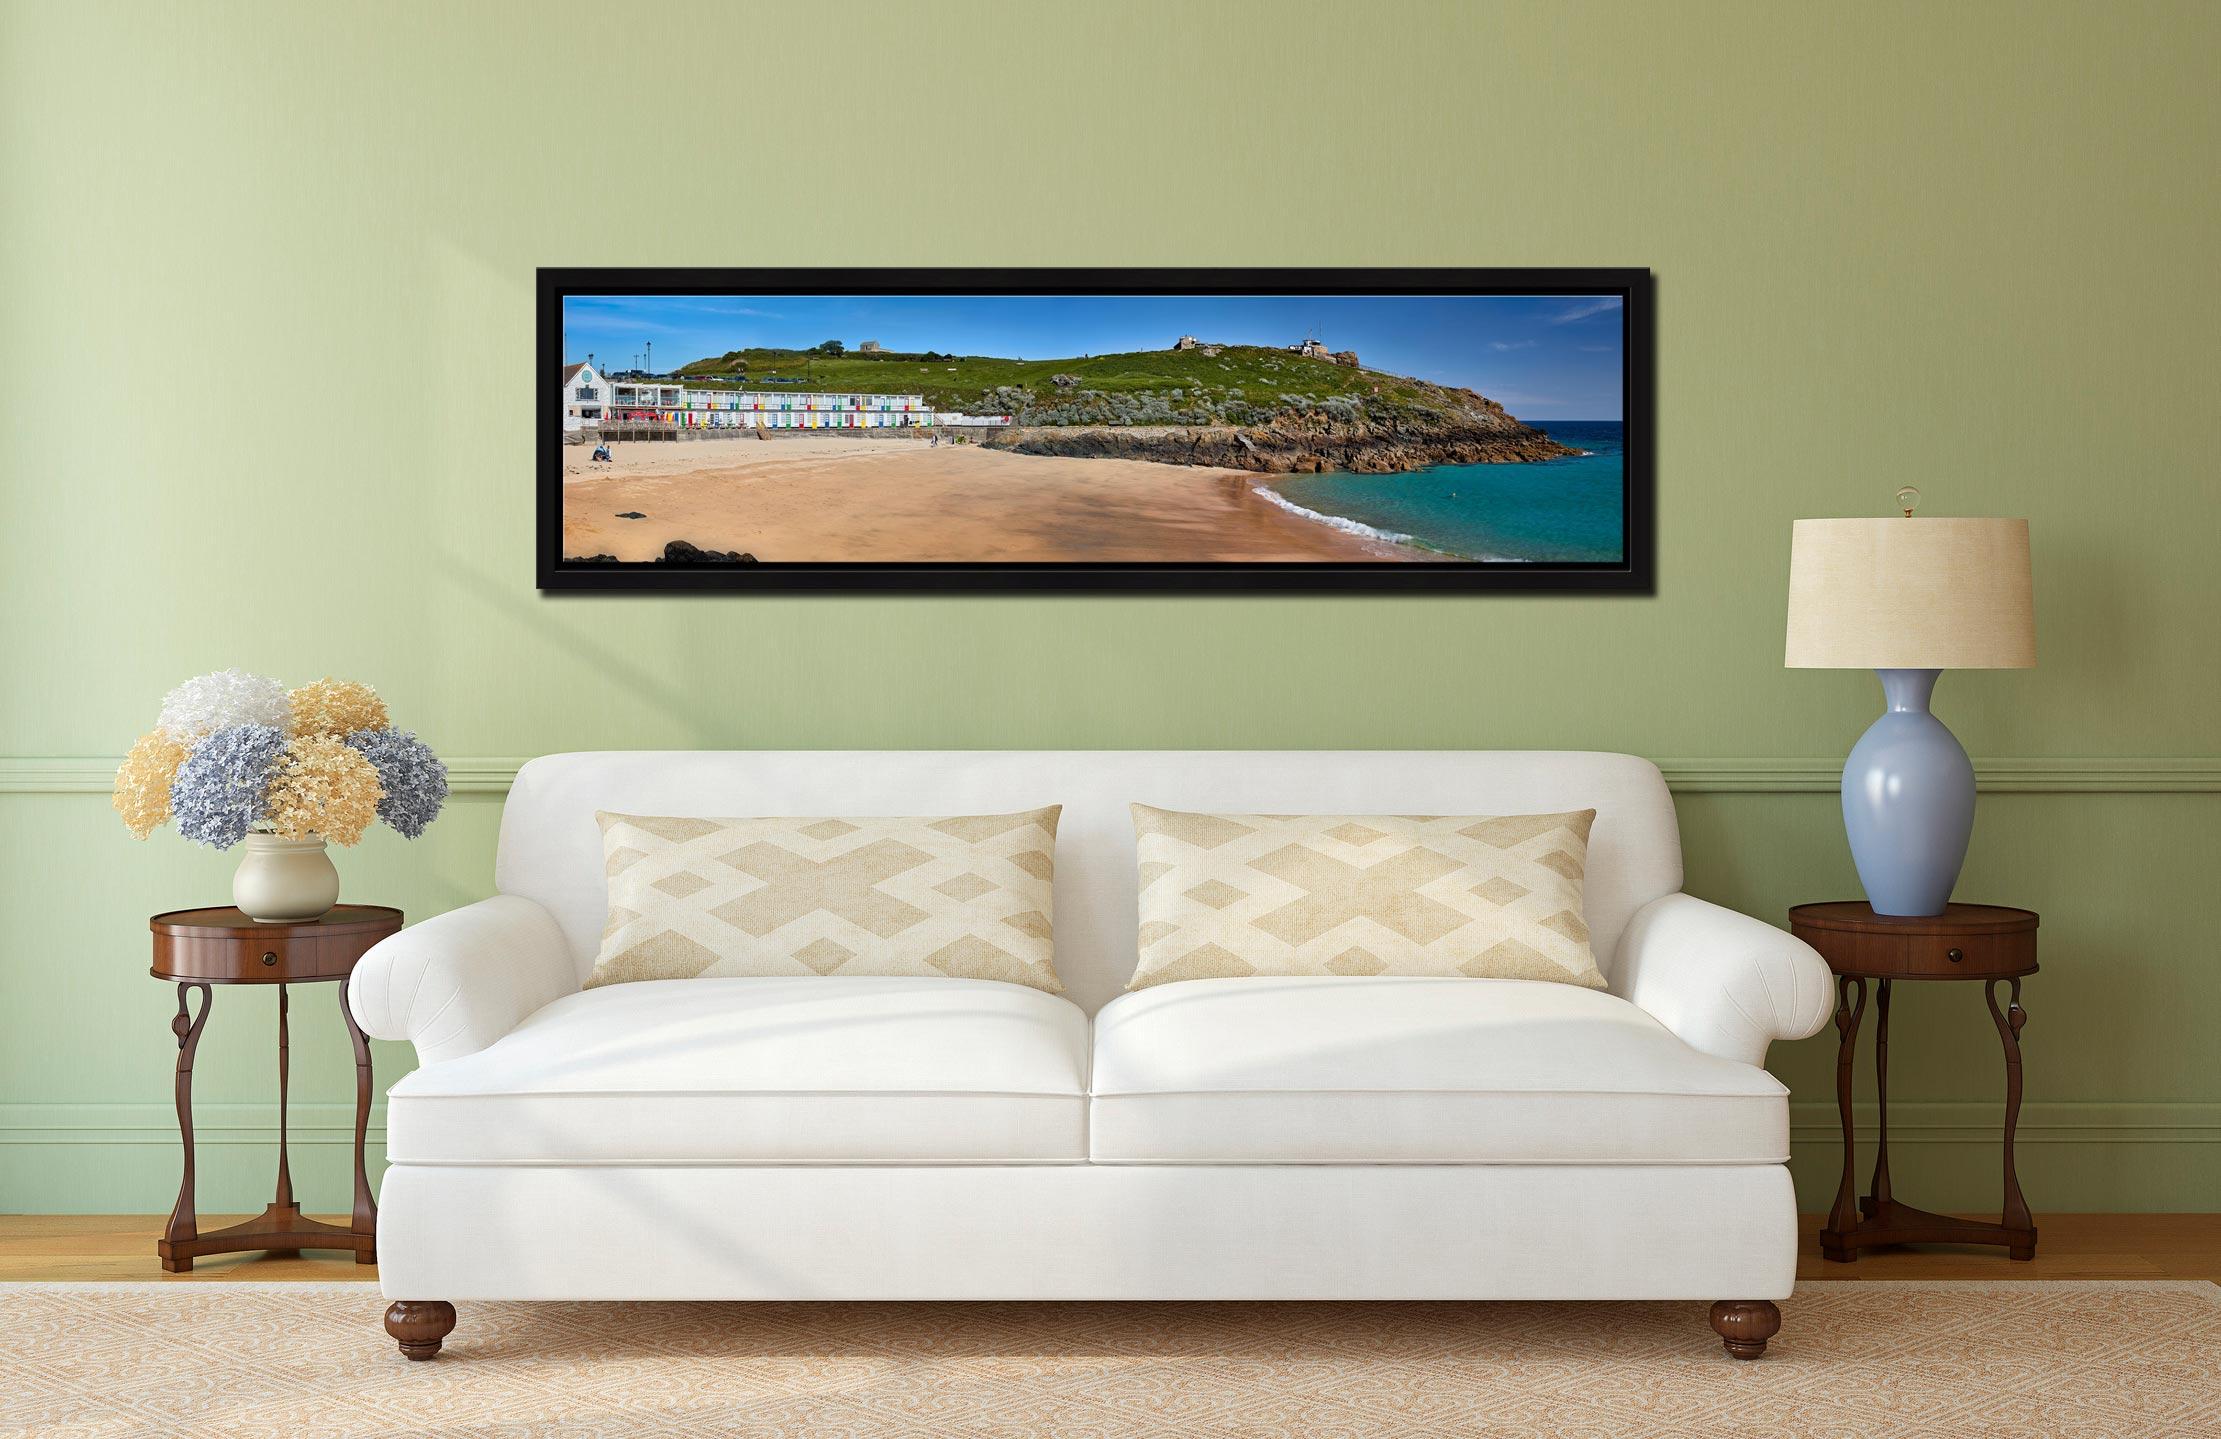 Porthgwidden Beach and The Island - Black oak floater frame with acrylic glazing on Wall